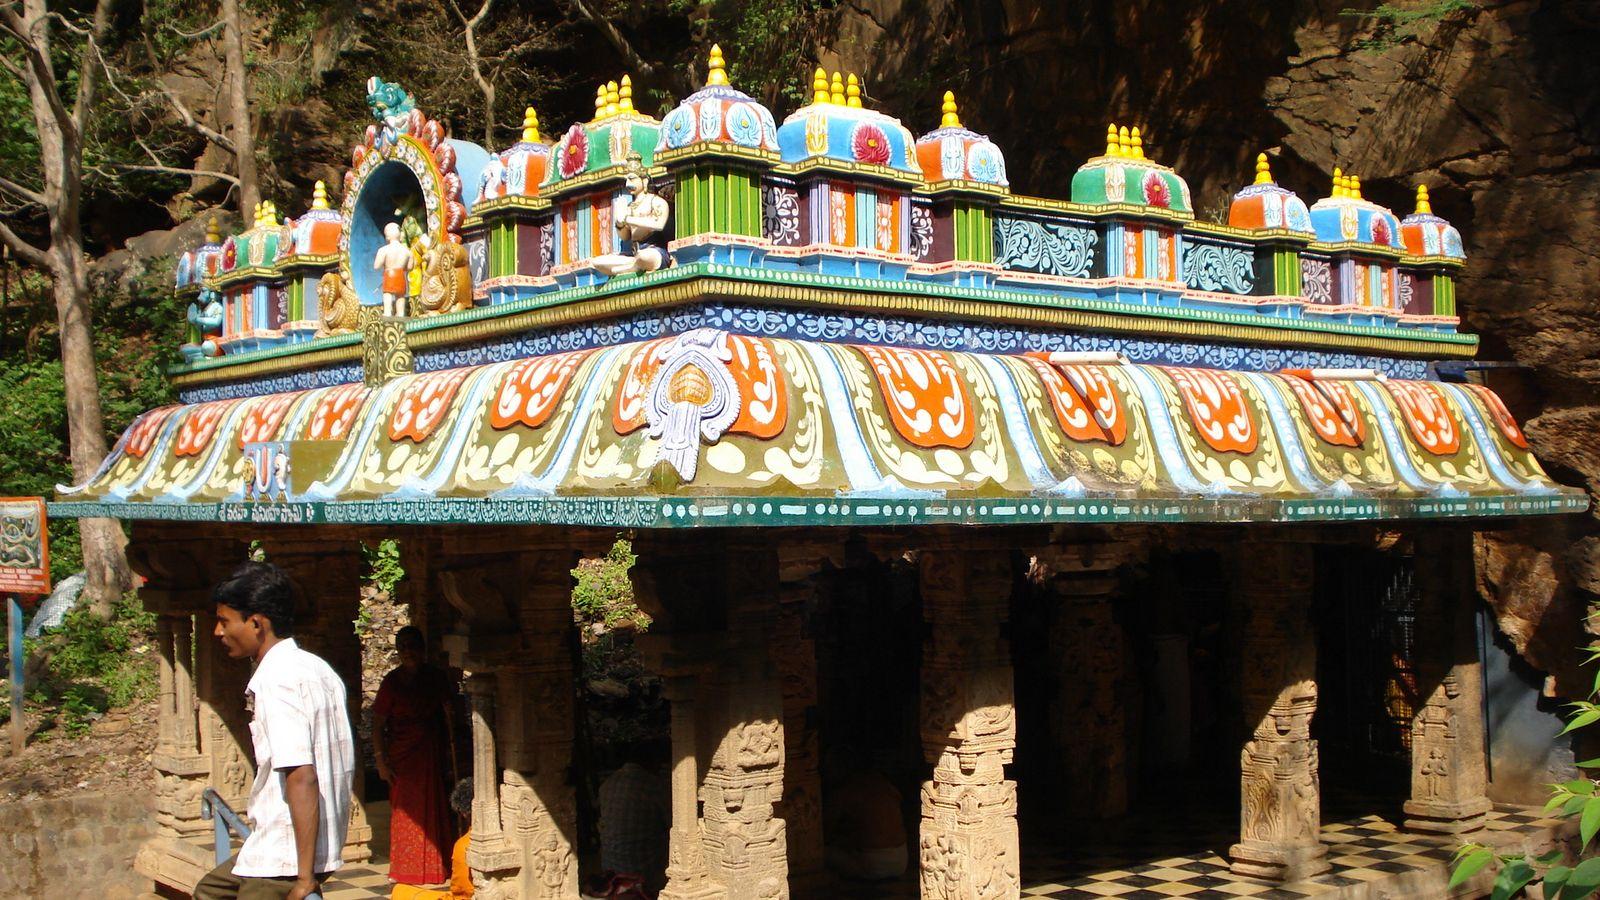 Krodakara (Varaha) Narasimha Swamy Temple